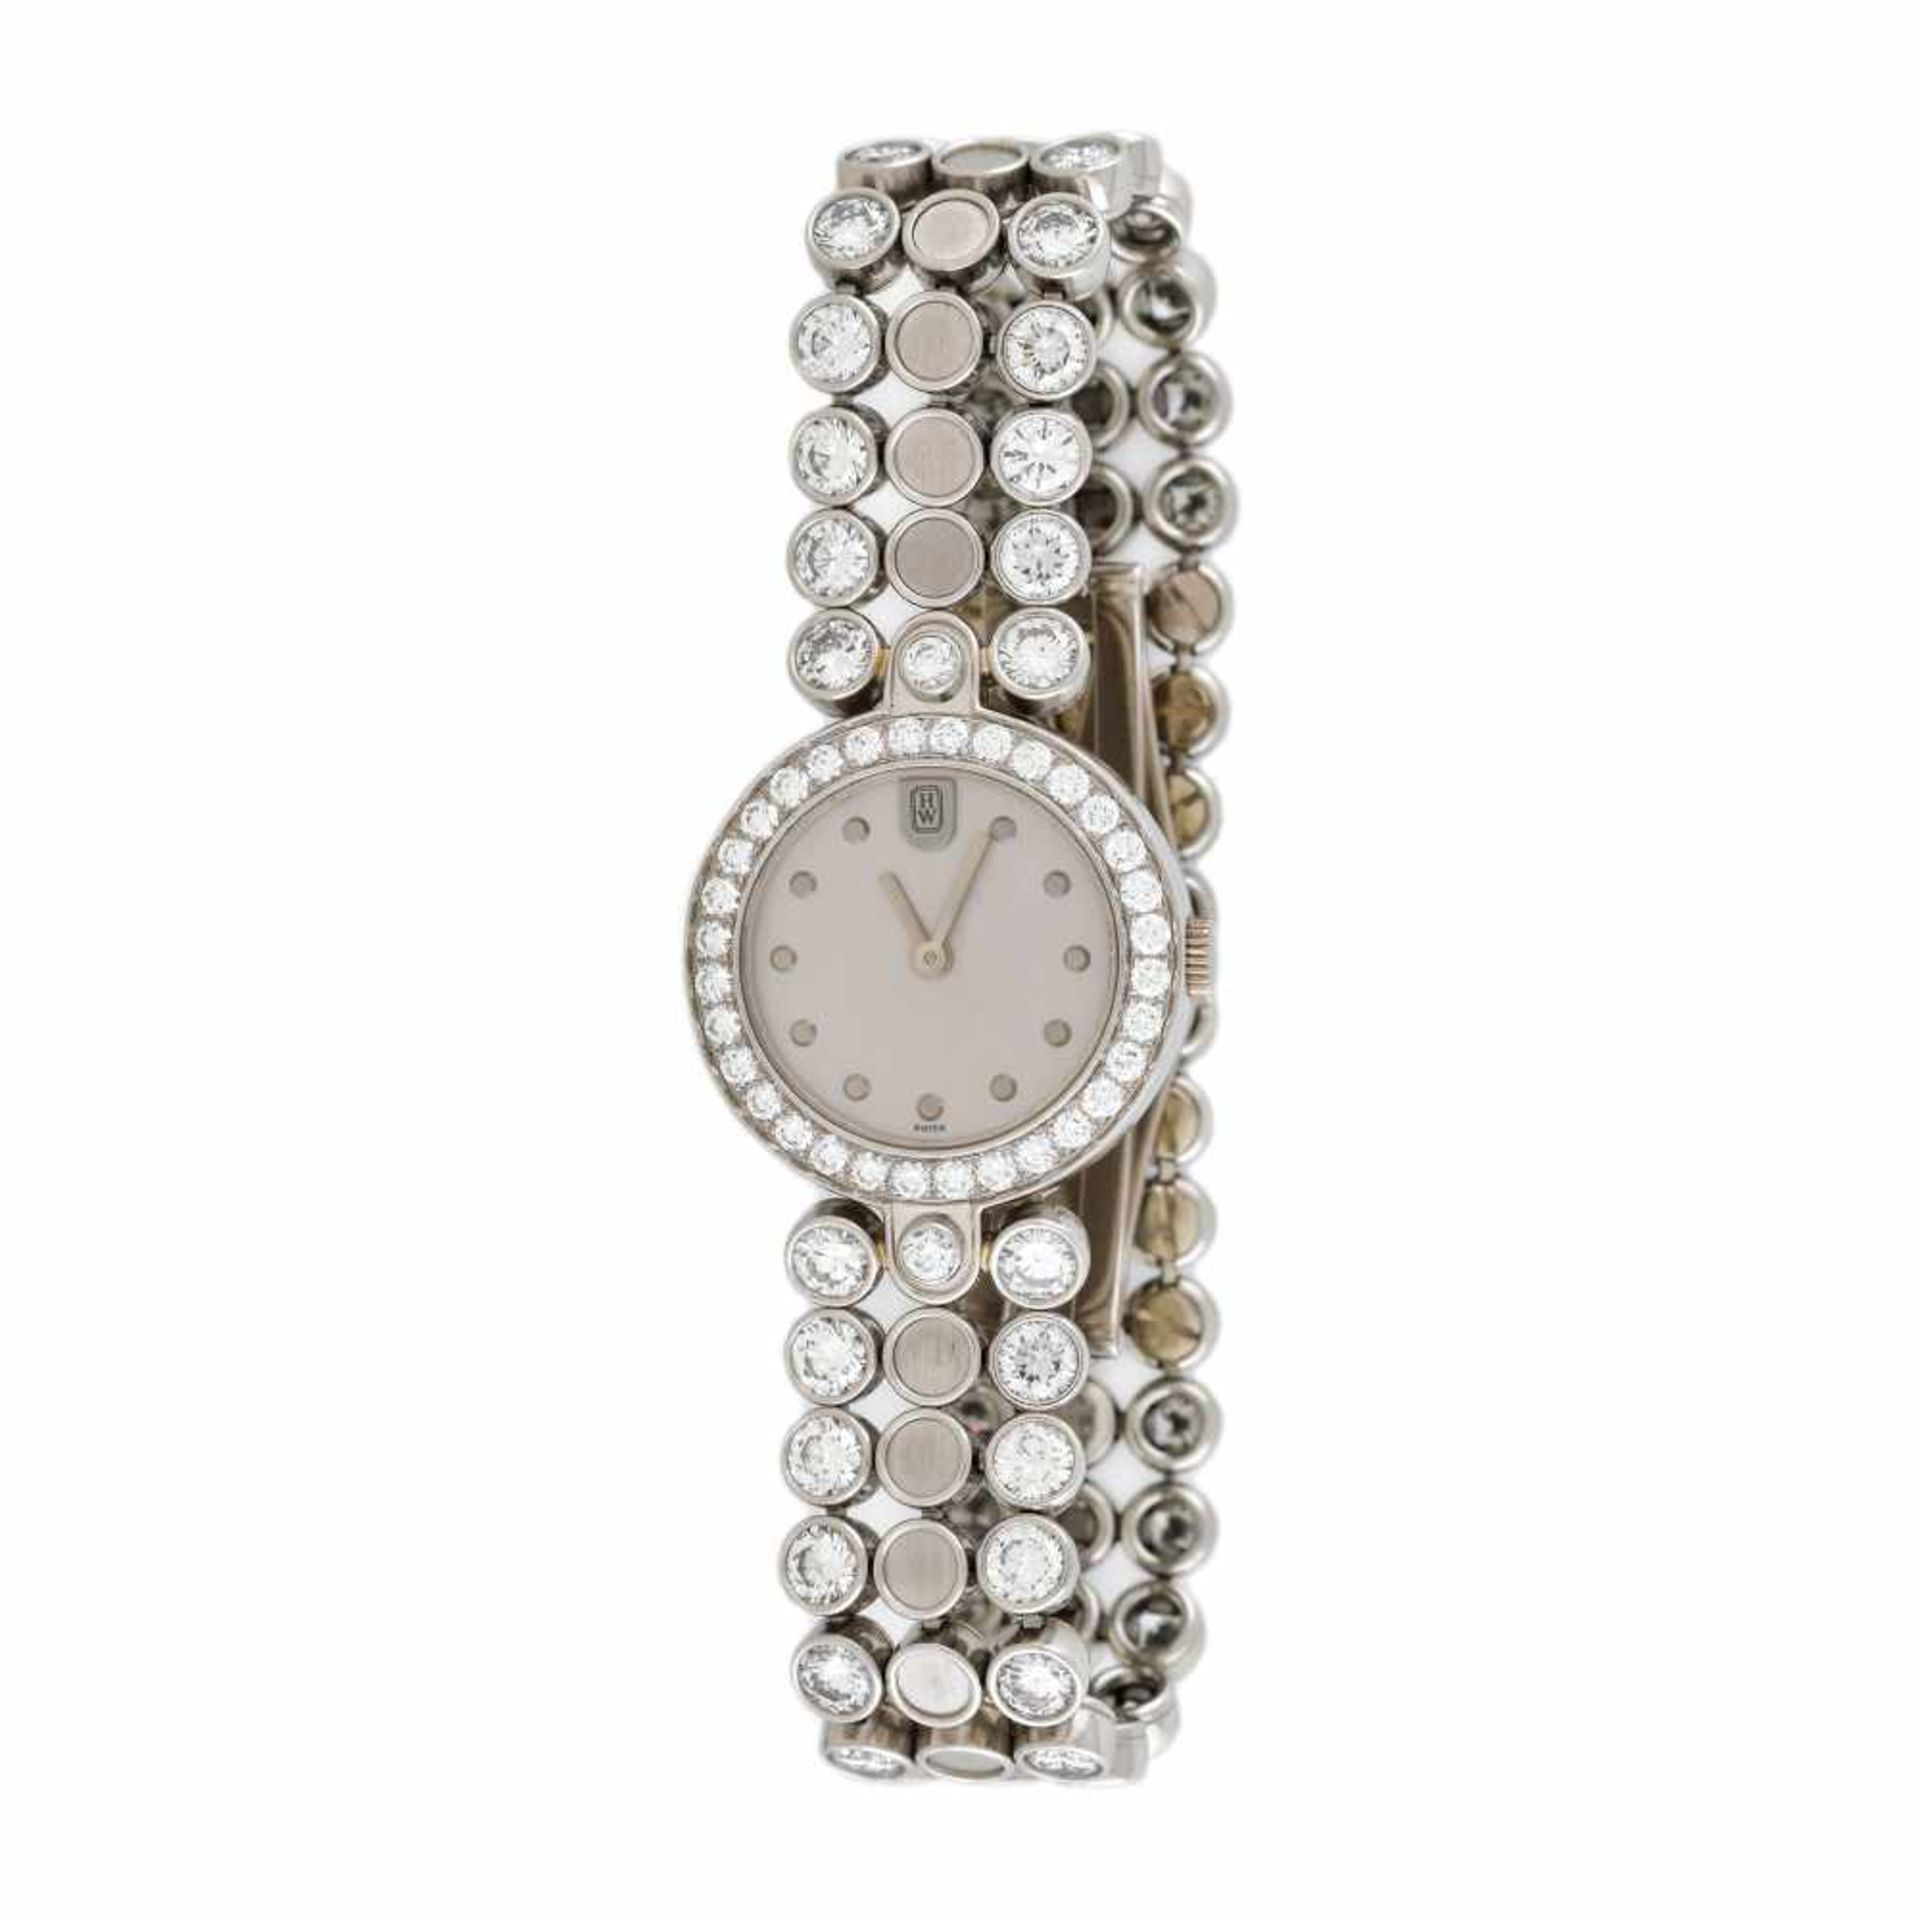 Harry Winston Premier Diamond Timepiece bracelet watch, platinum, women, decorated with diamonds, pr